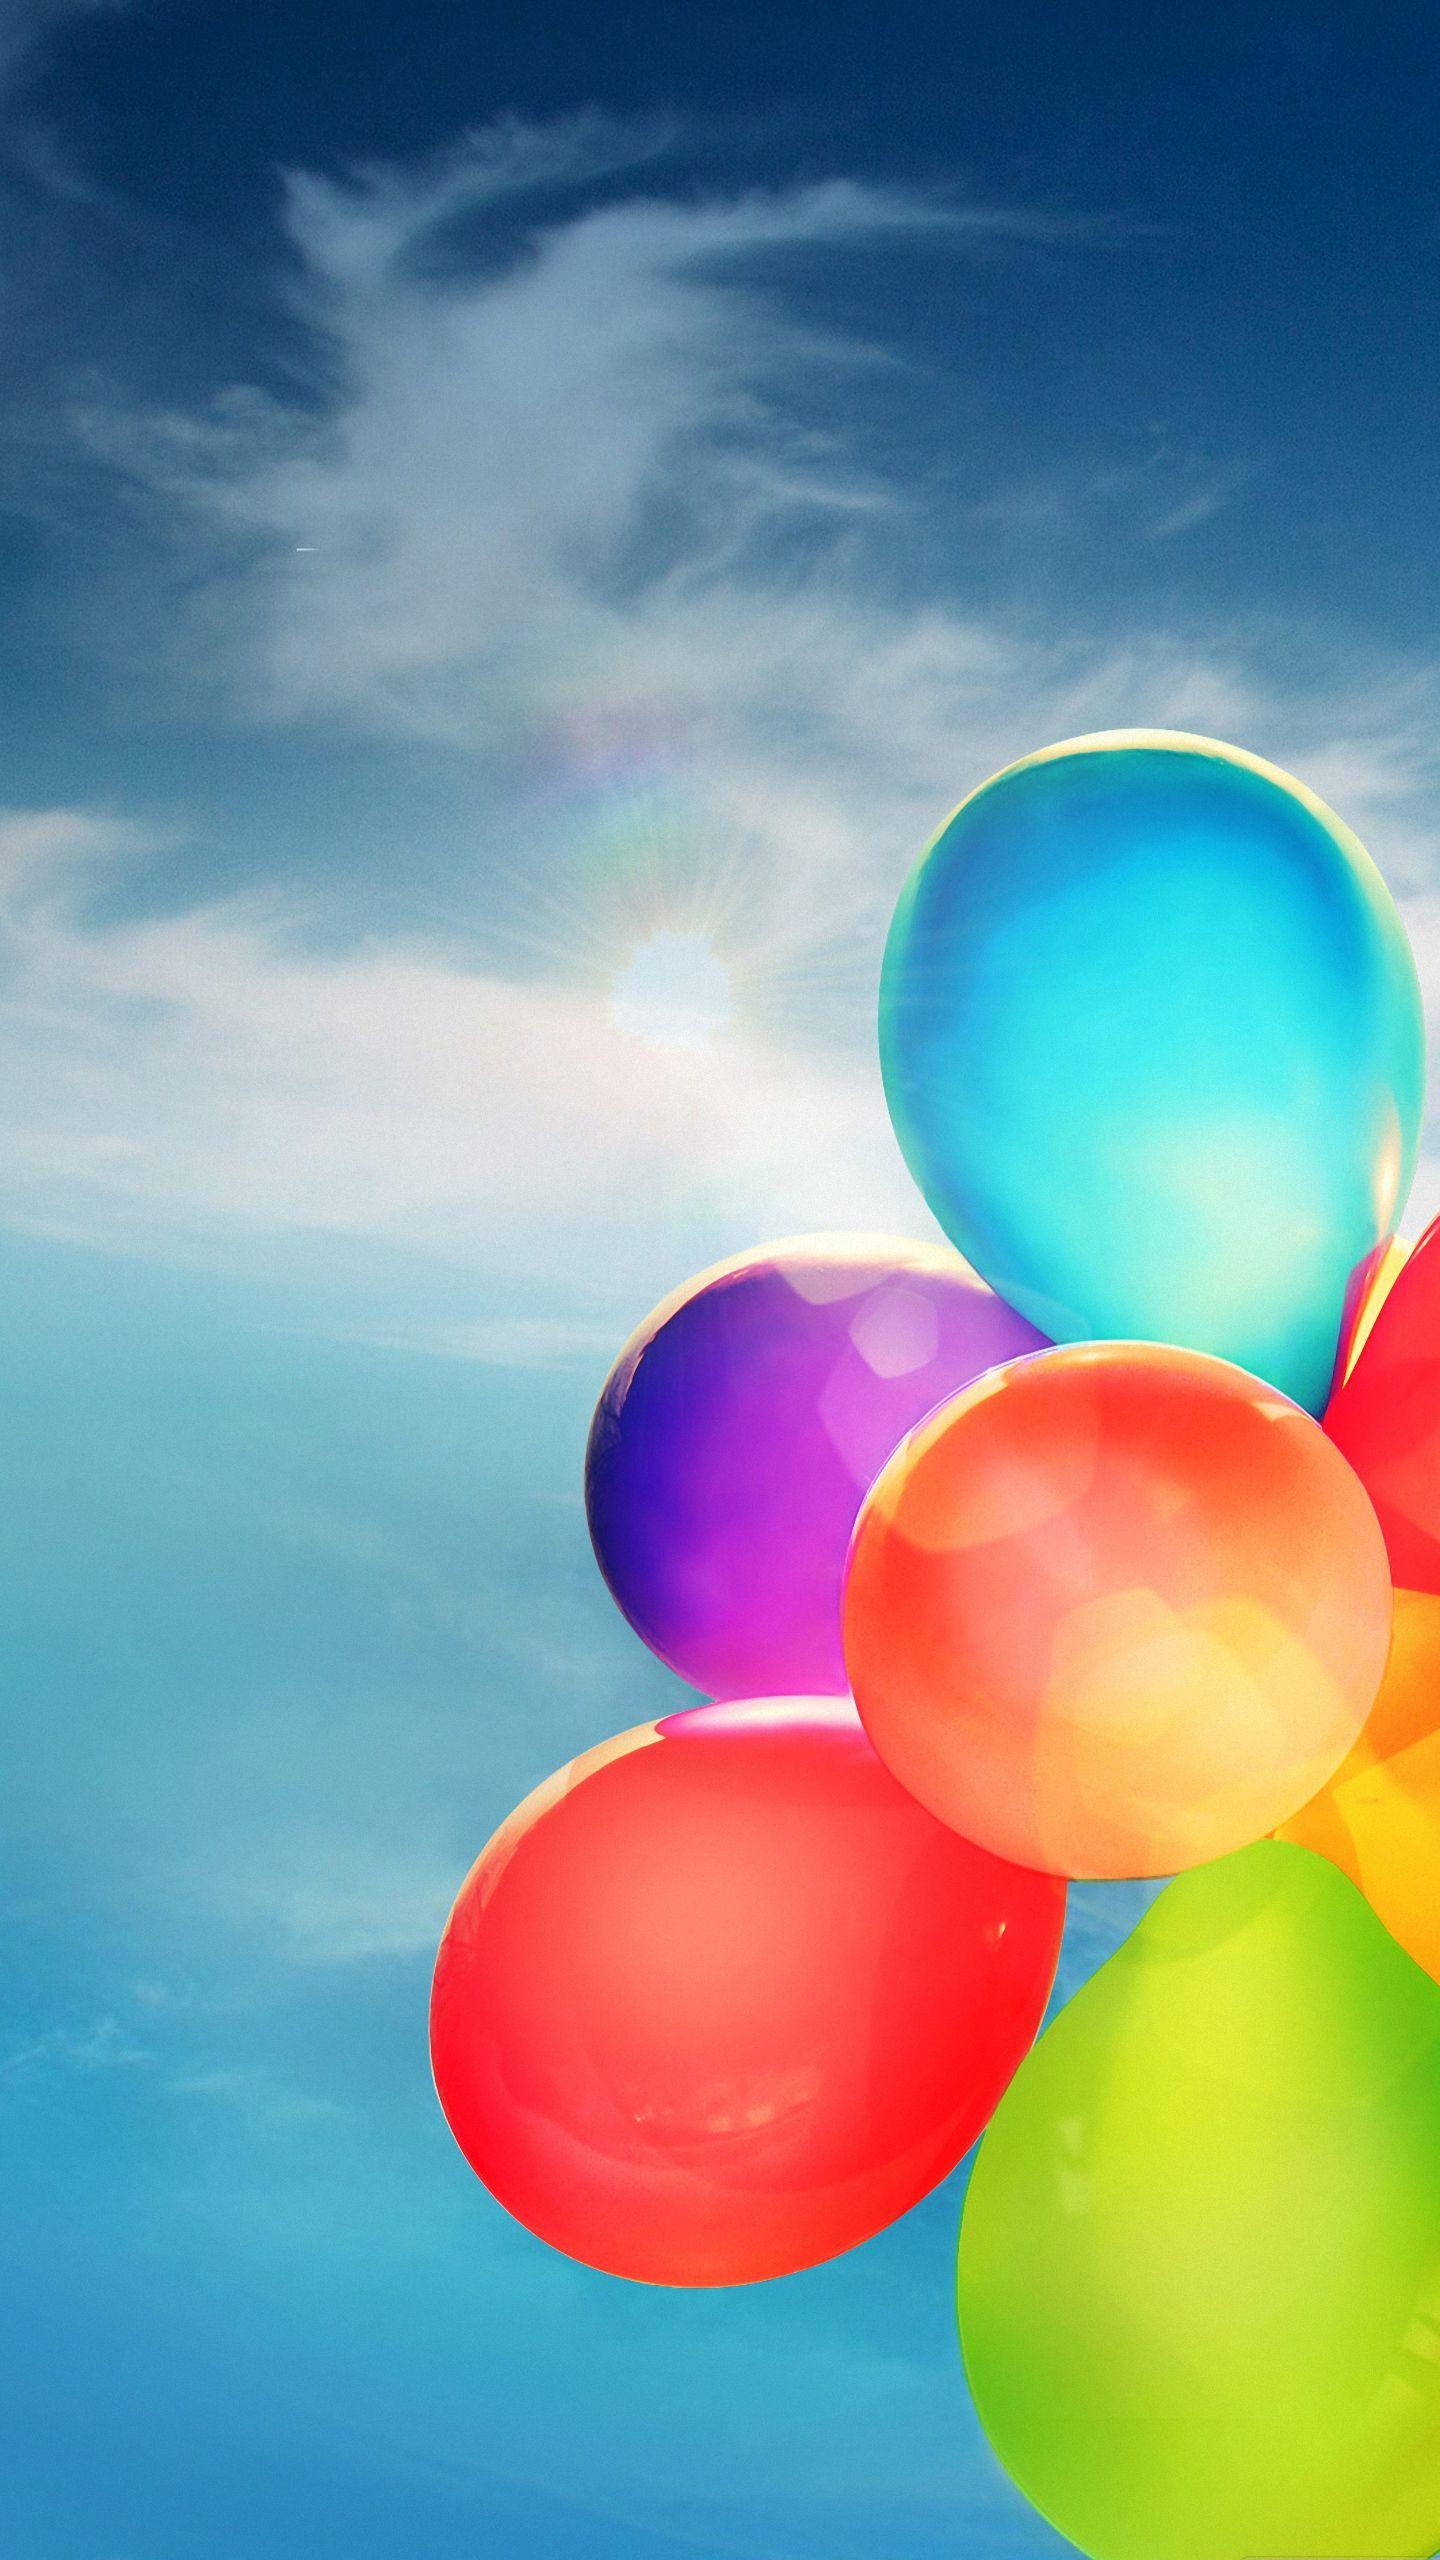 Hd 1440x2560 Wonderful Color Balloon Htc Desire Wallpapers Iphone 6 Wallpaper Best Iphone Wallpapers Balloons